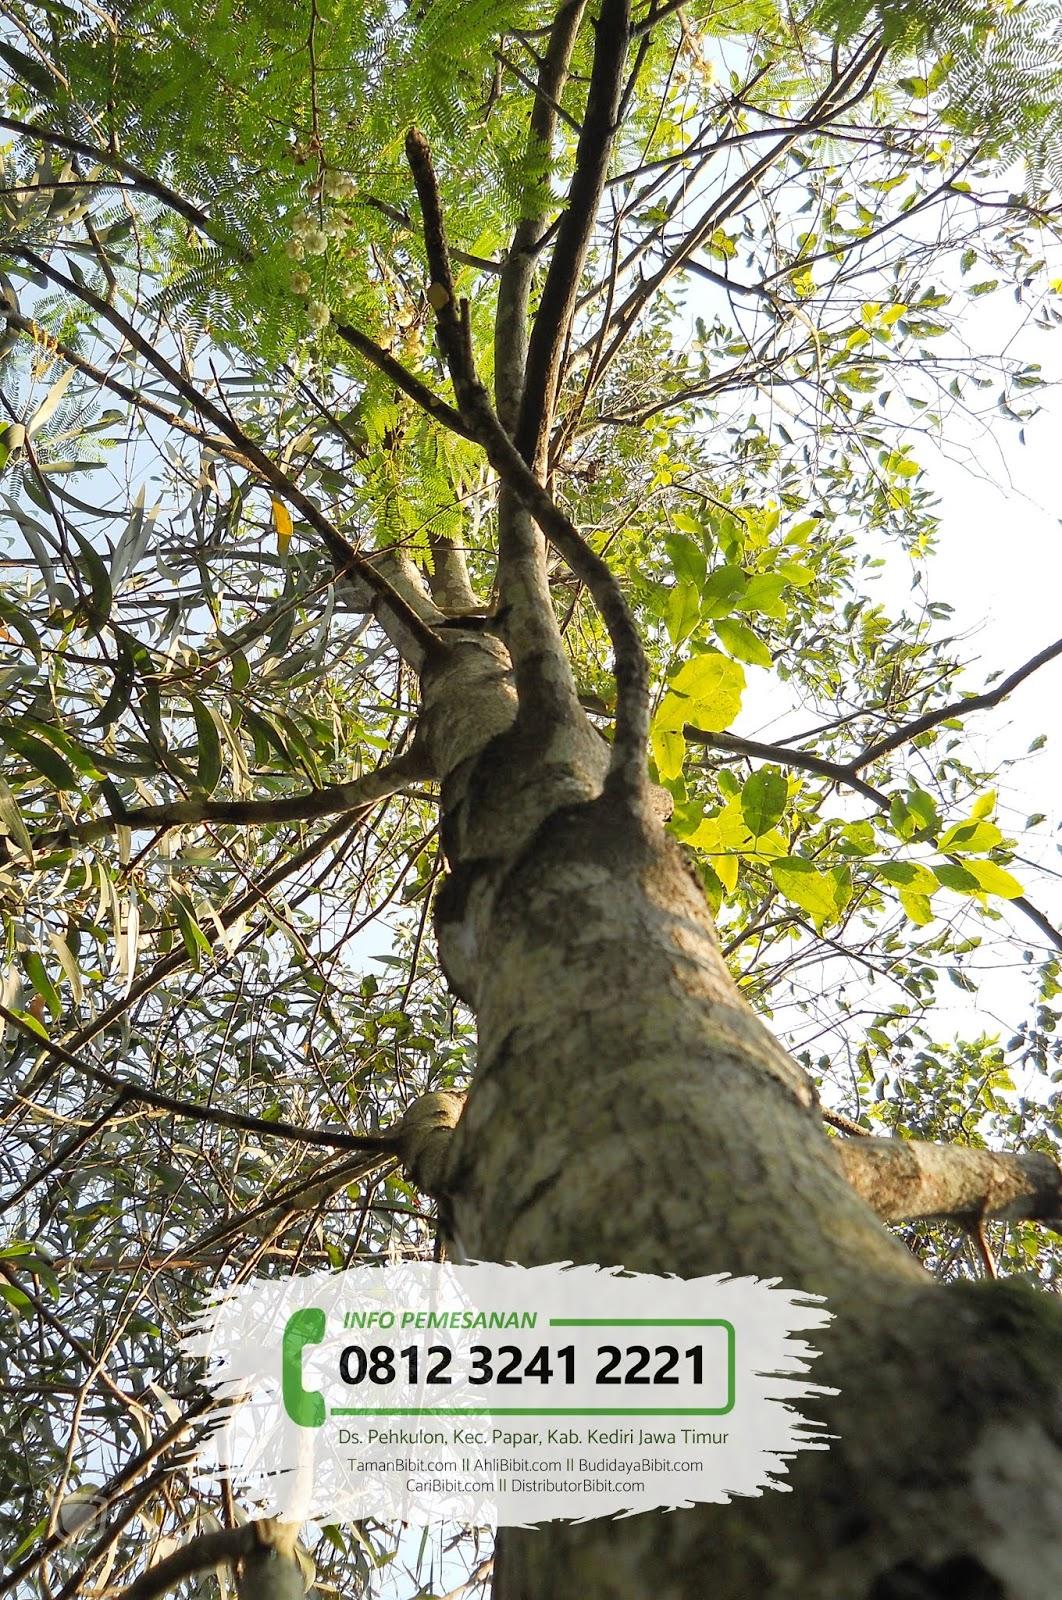 Jual Bibit Pohon Cendana NTT